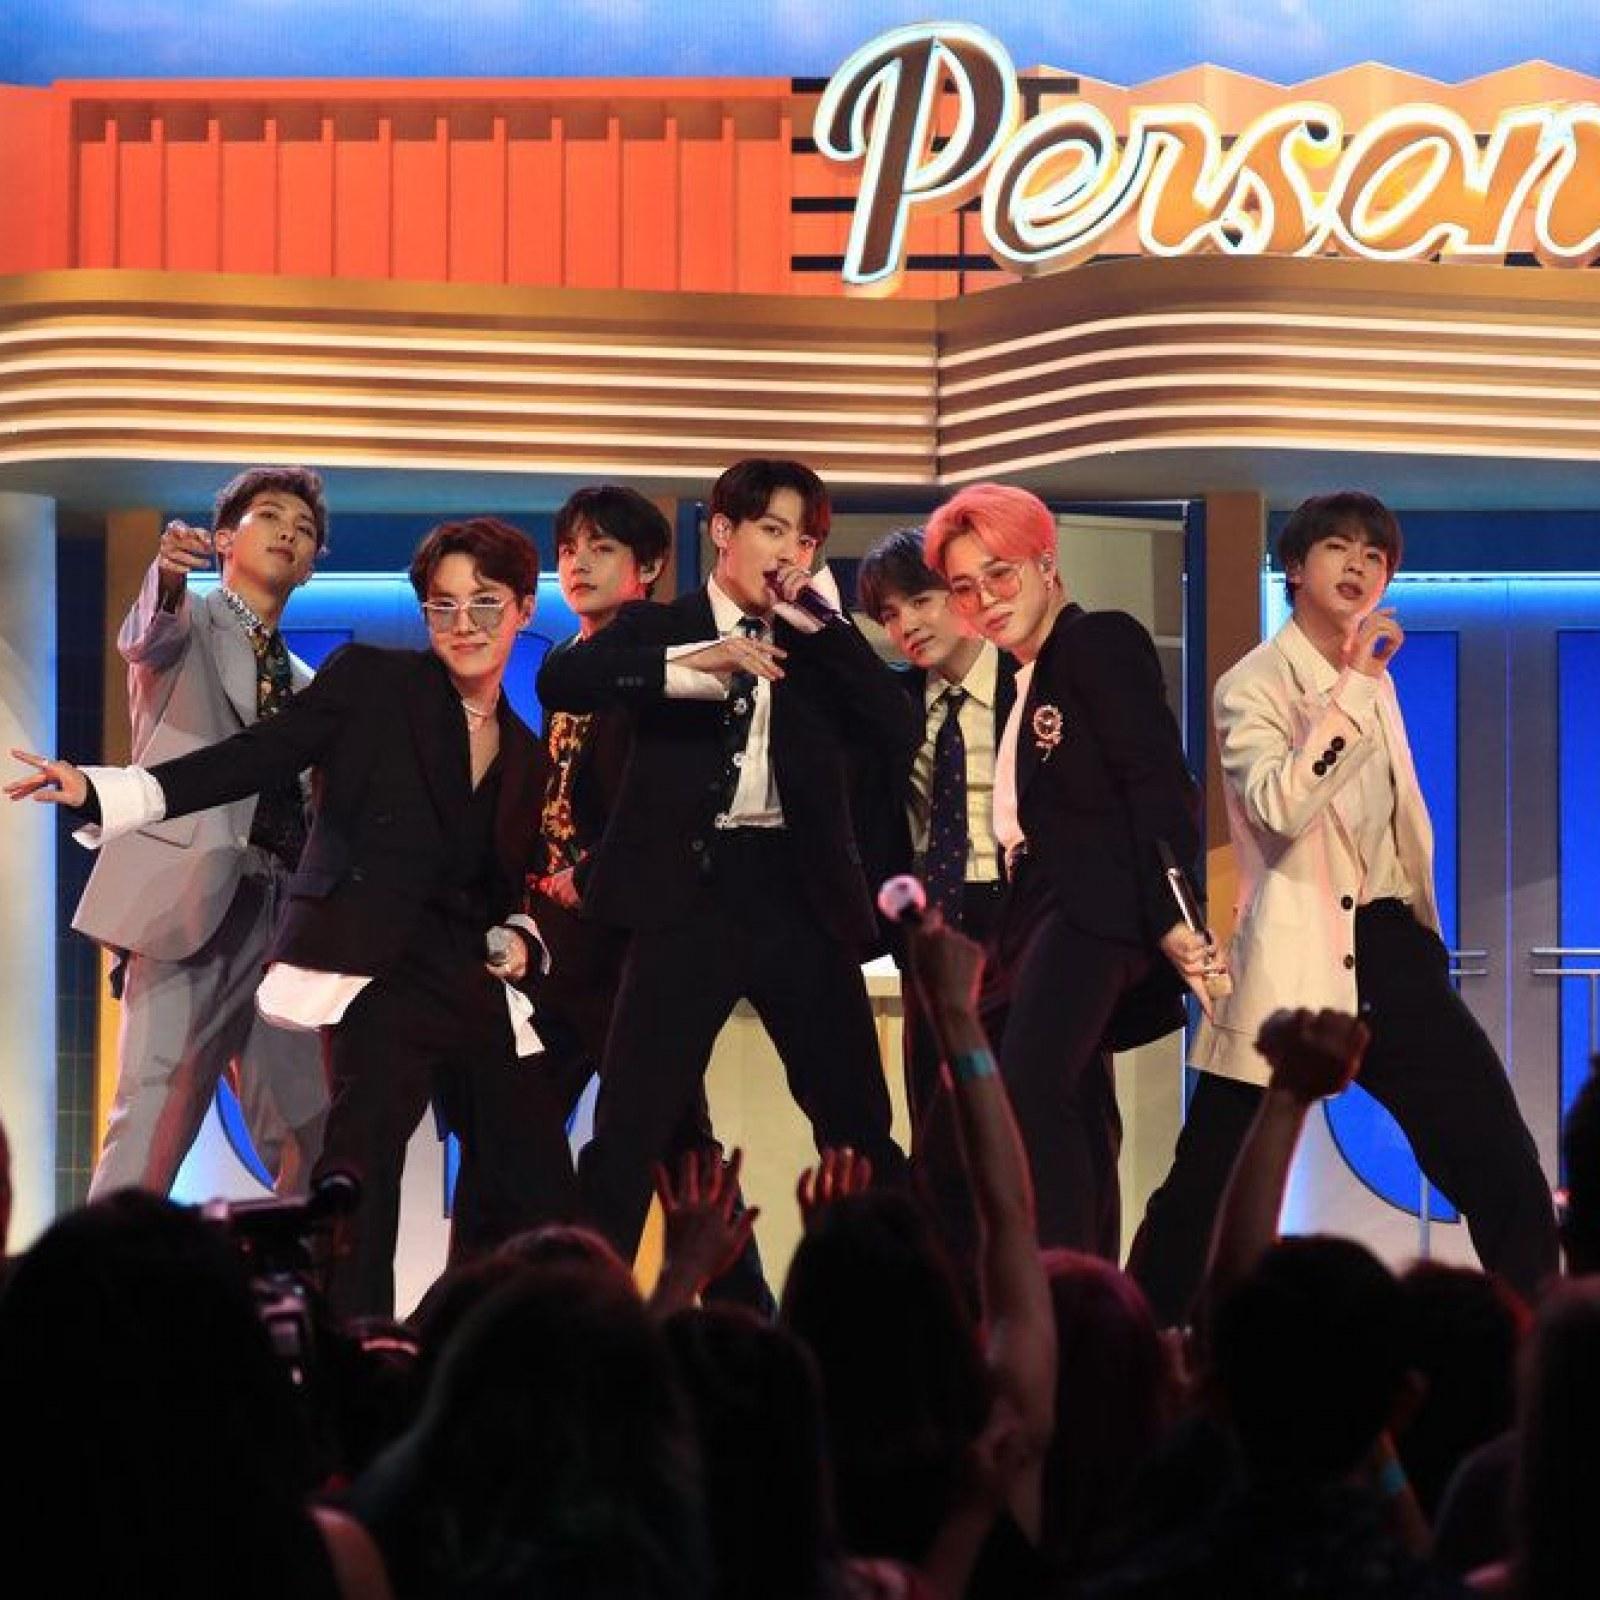 Who Won 'The Voice' 2019? Season 16 Finale Results & Recap